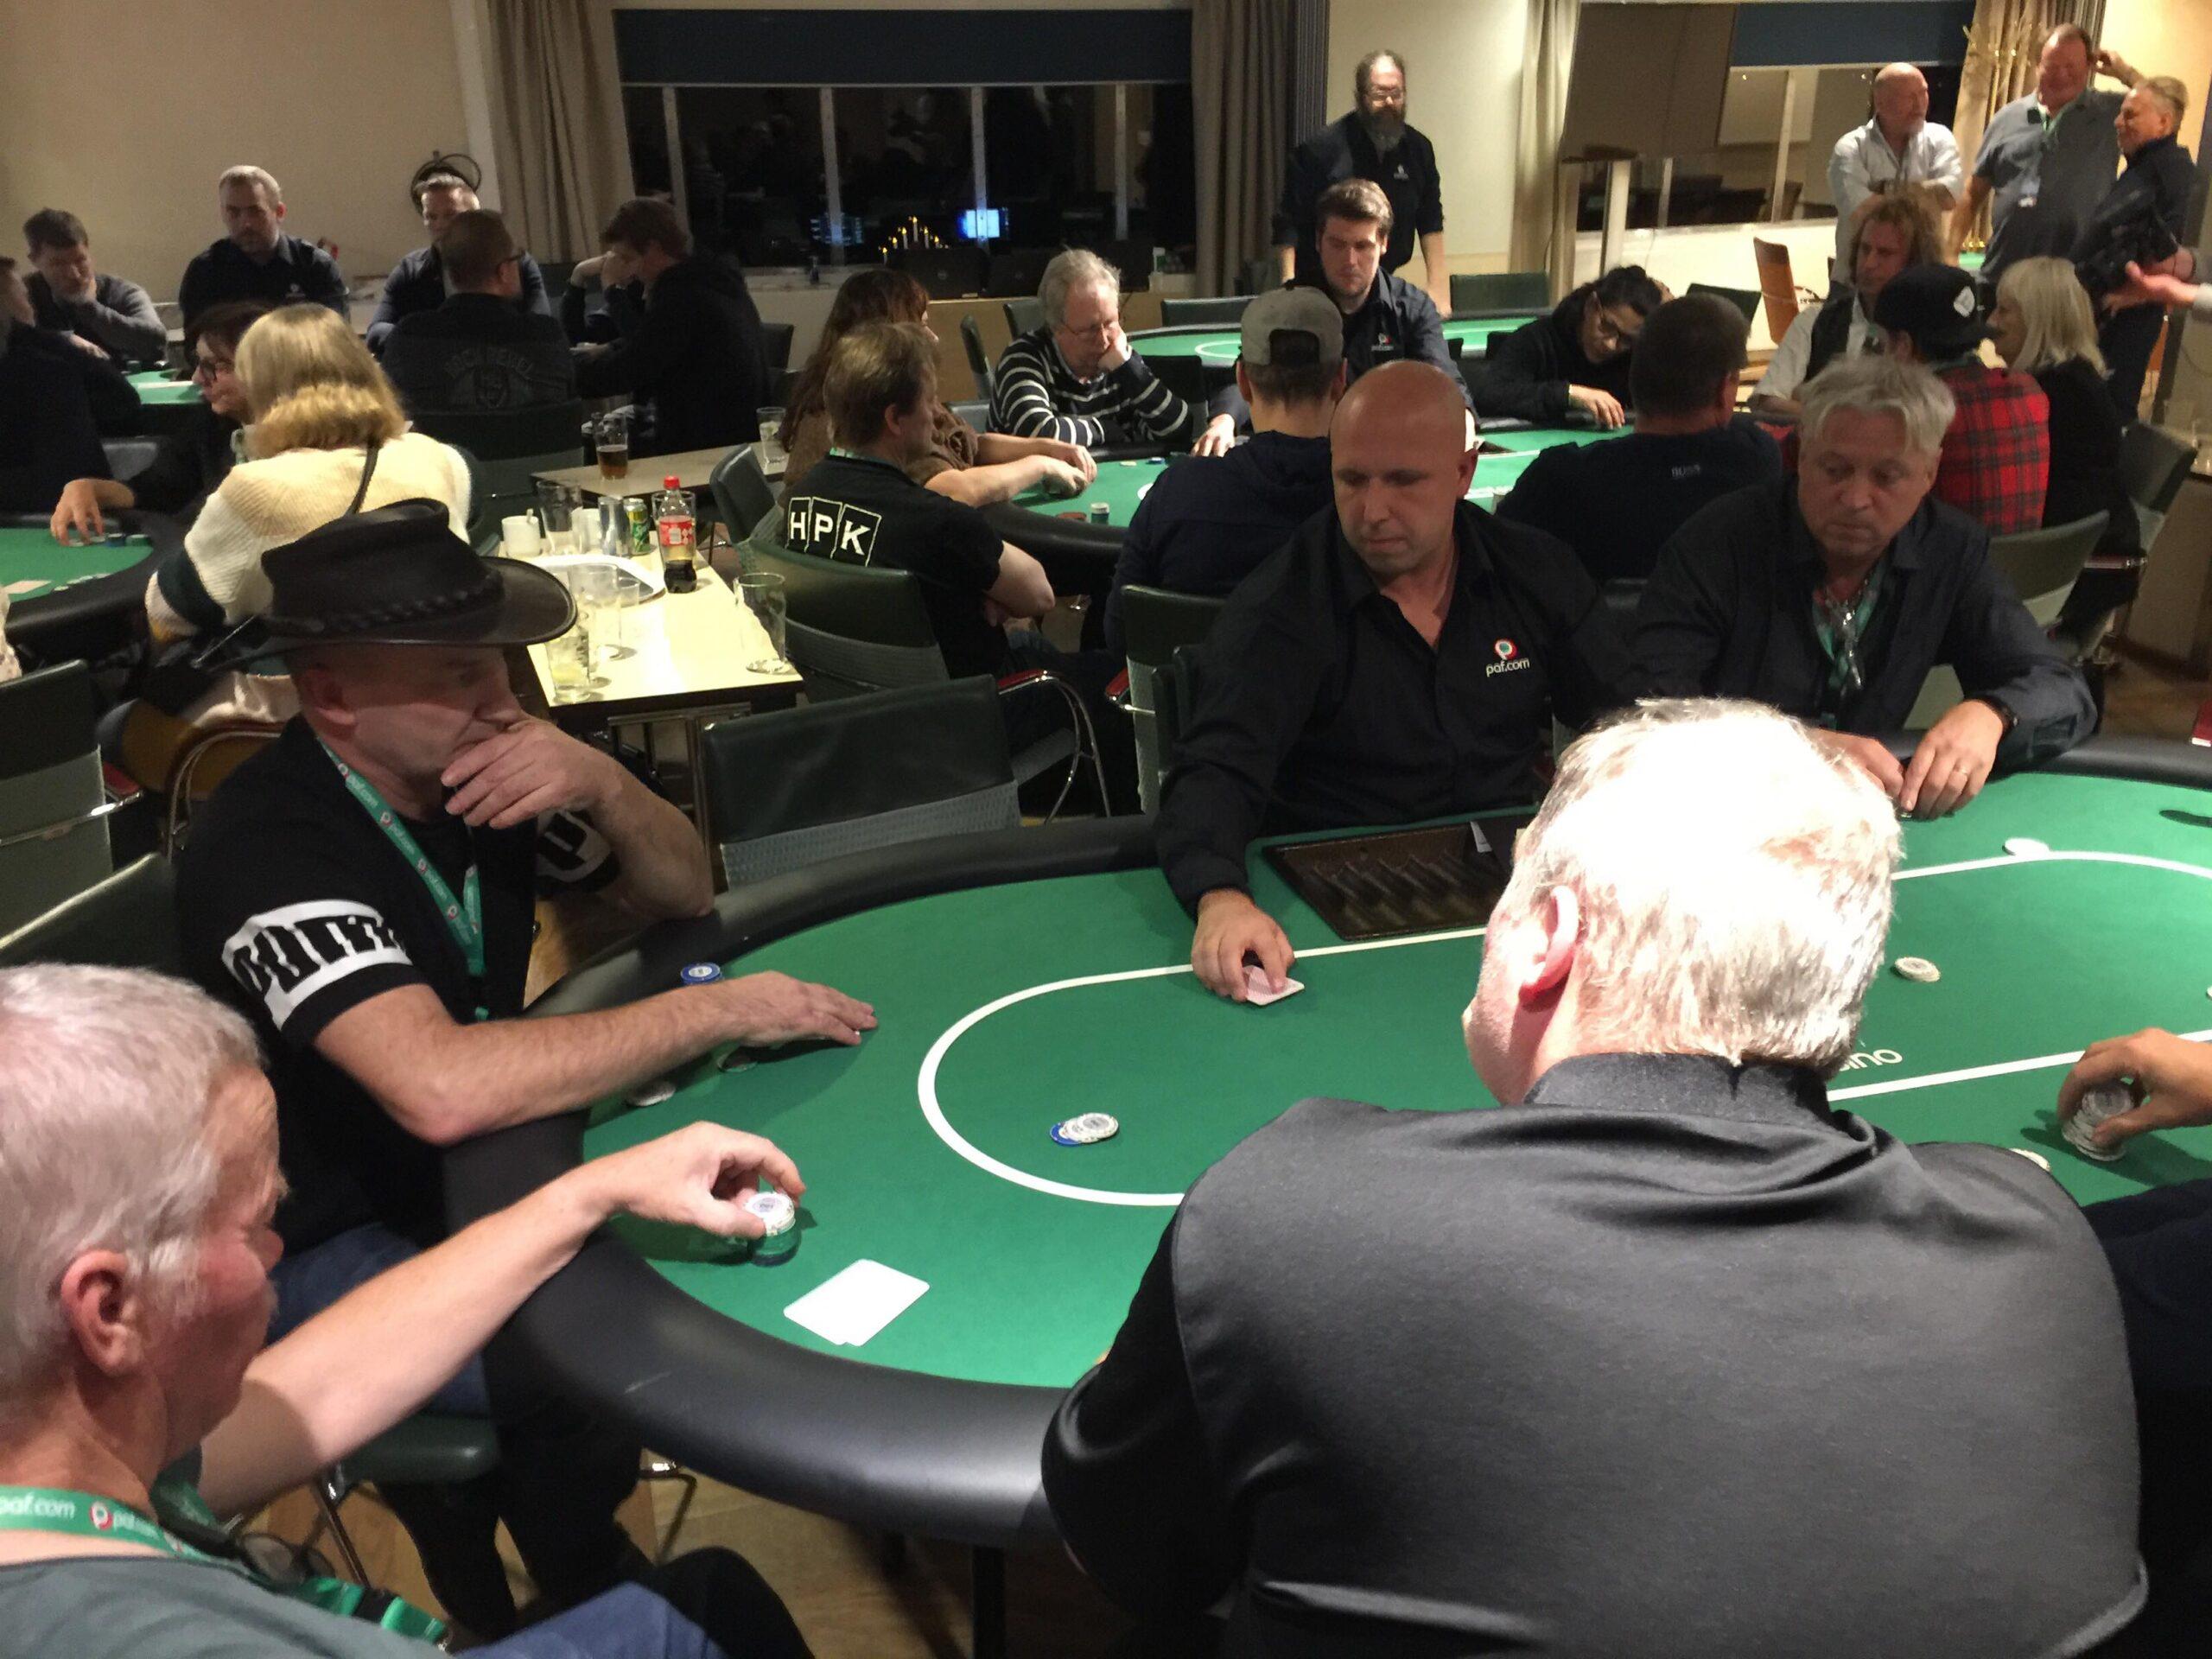 HPK-Jörgen från Paf Poker Cruise